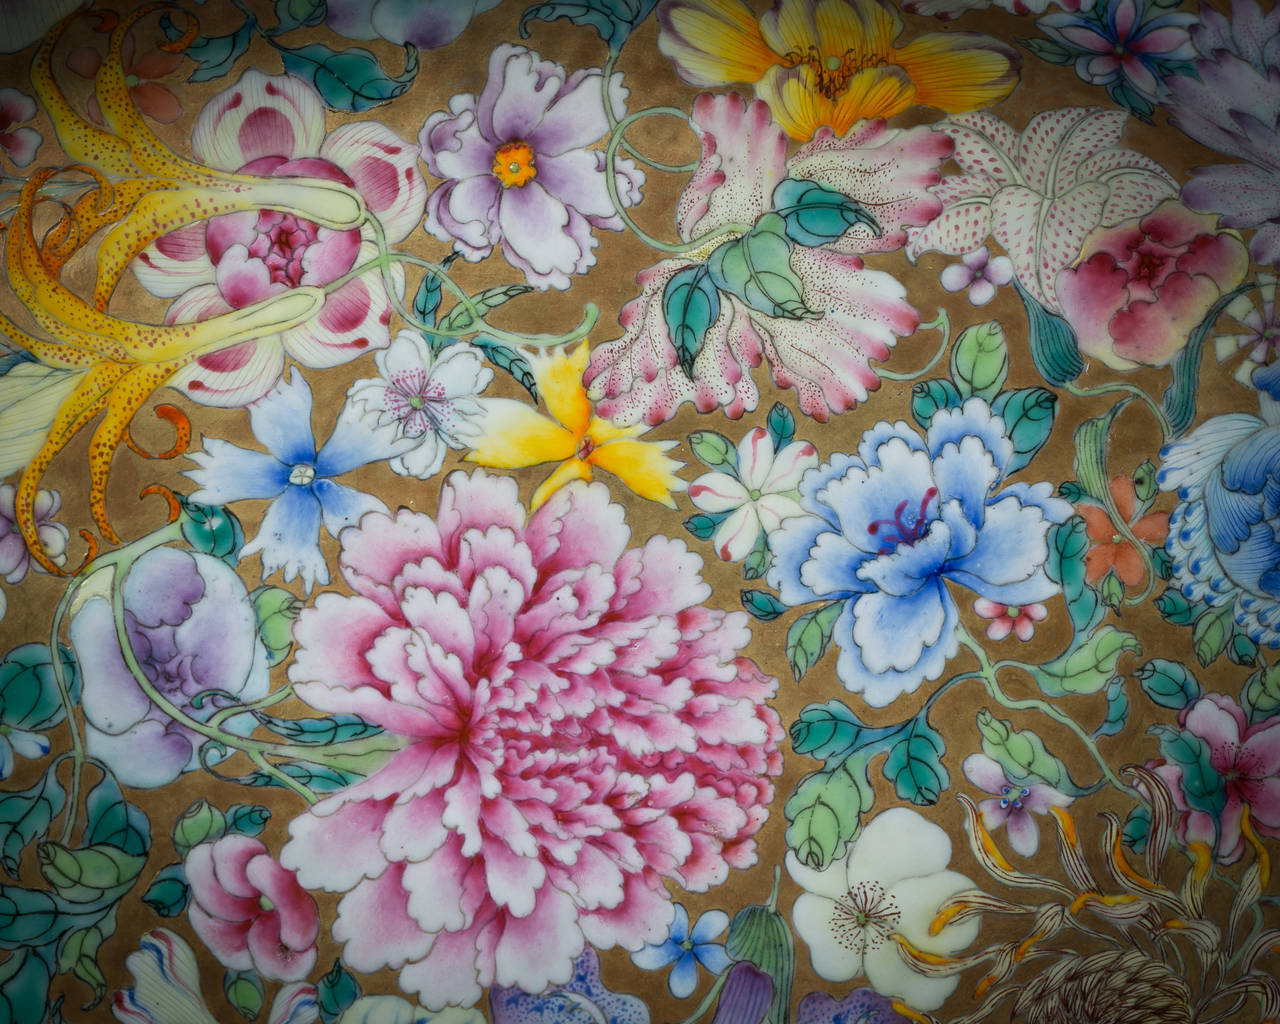 Chinese Export platter, circa 1820.  Mille fleur pattern.